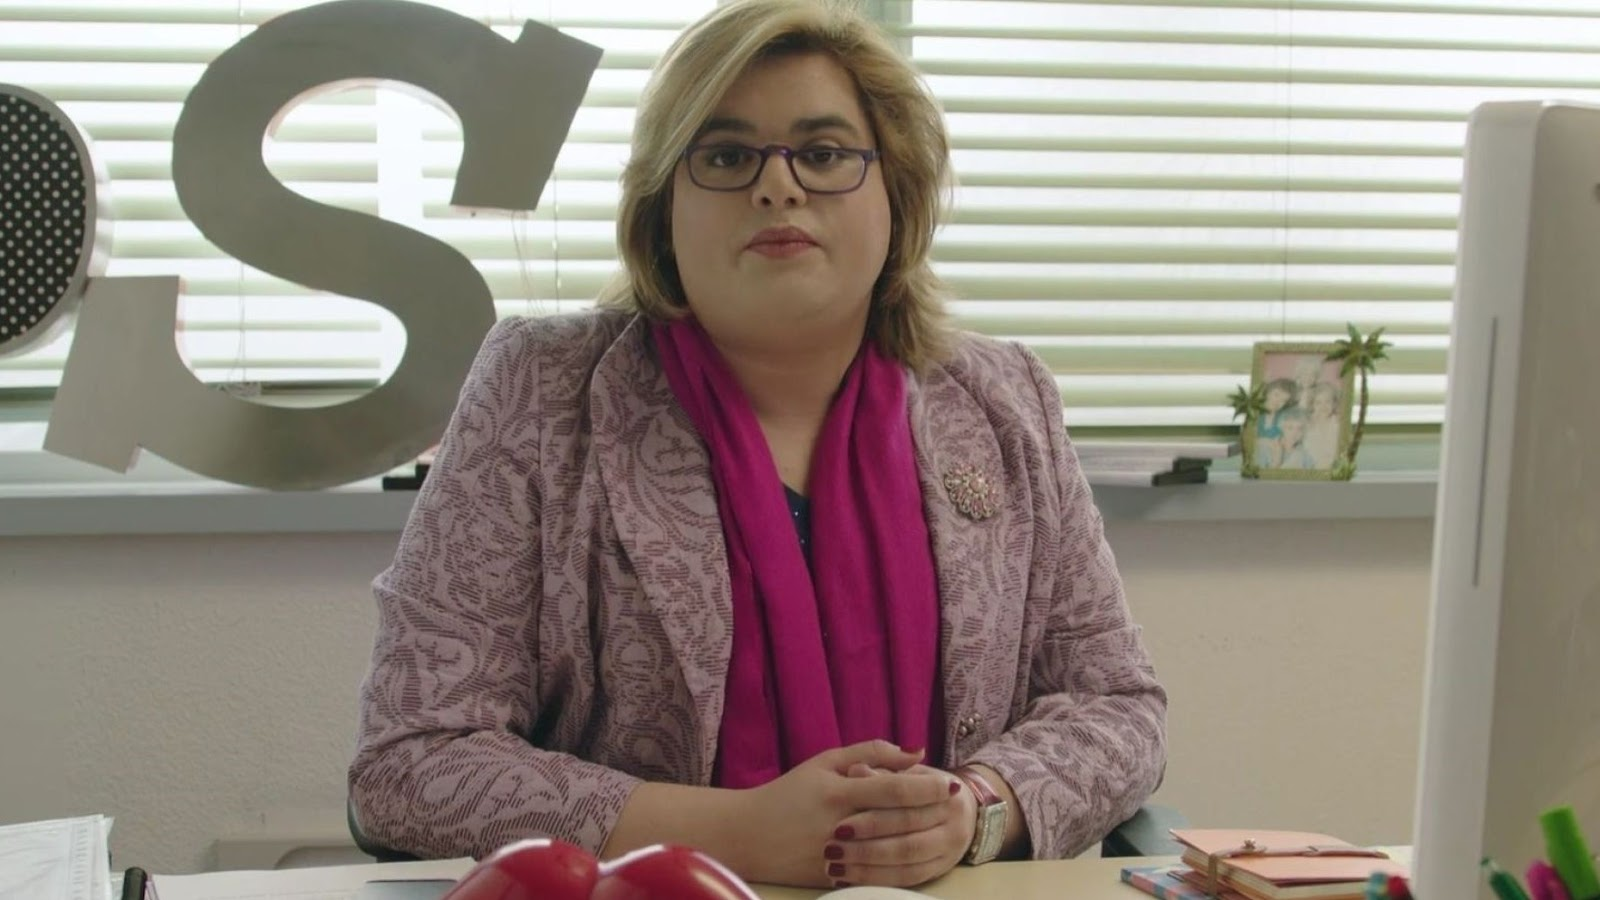 Paquita Salas, interpretada por Brays Efe en 'Paquita Salas'